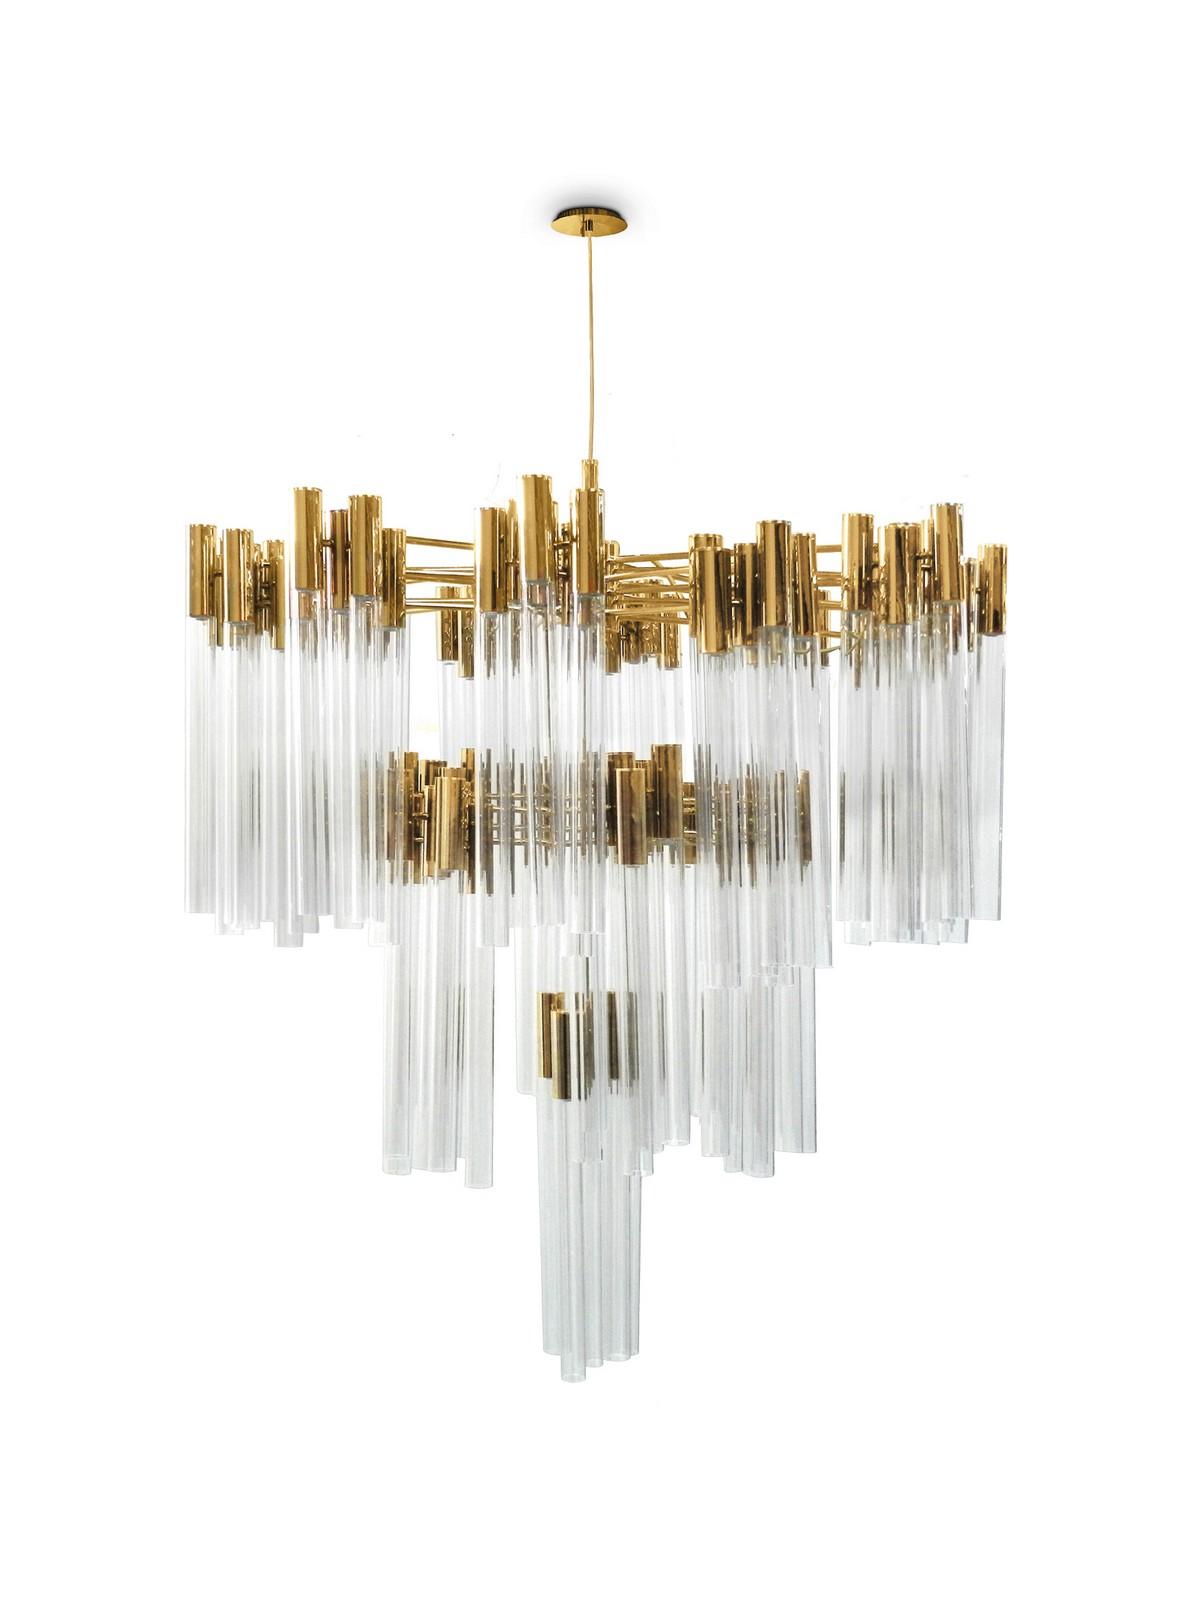 Exclusive Lighting Designs You Will Love exclusive lighting designs Exclusive Lighting Designs You Will Love burj chandelier2